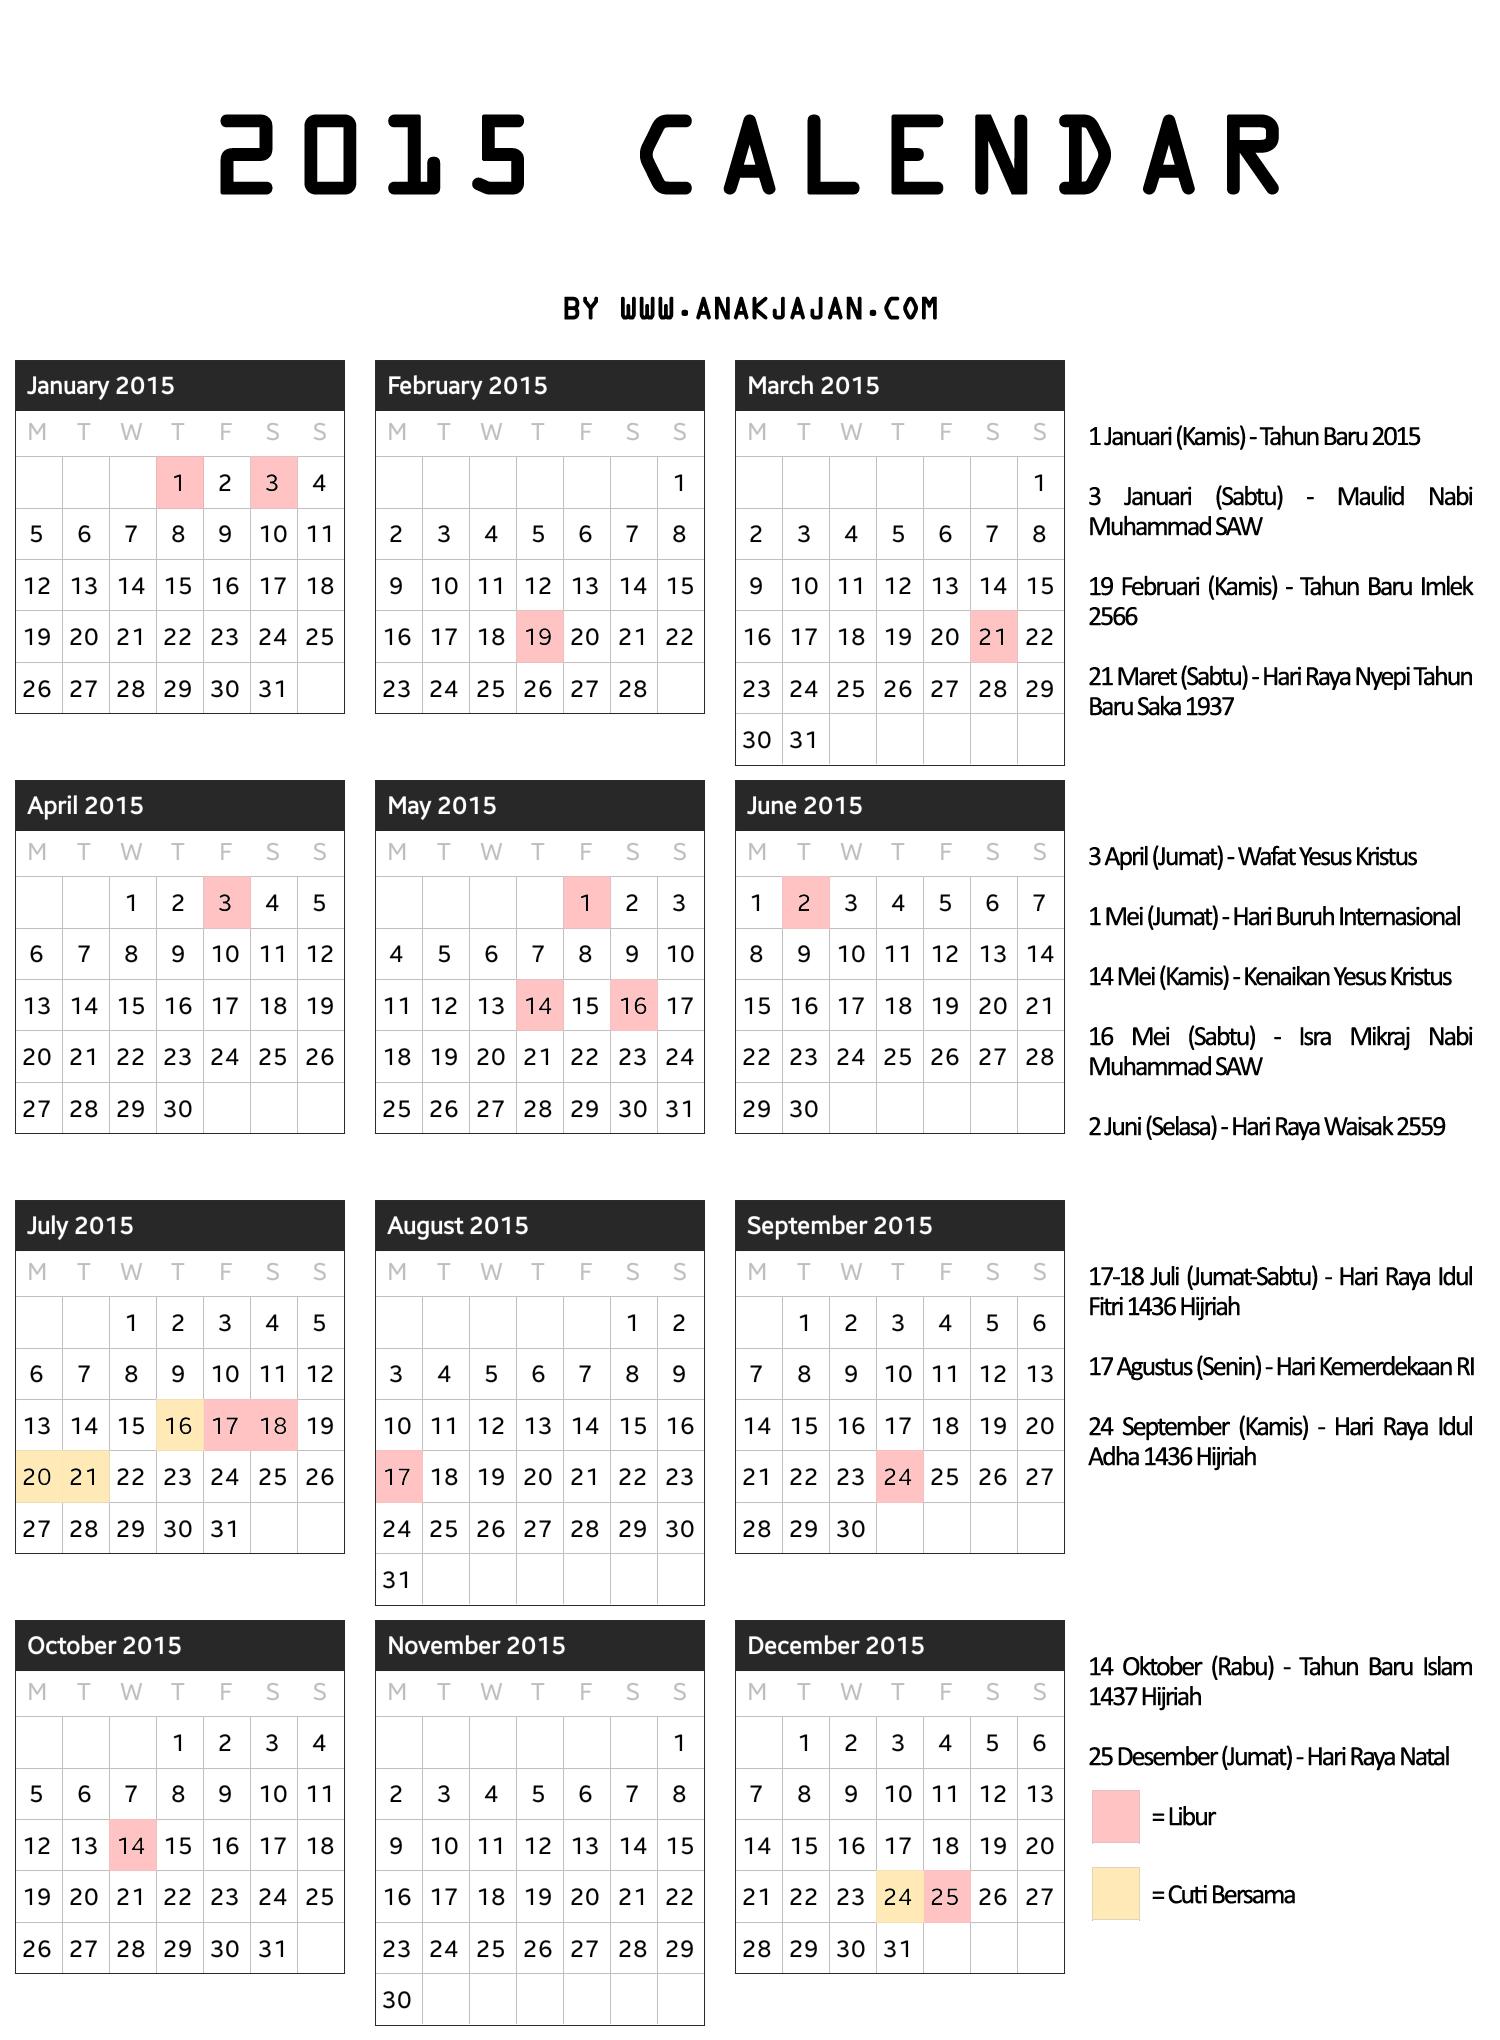 Every Year Calendar Yearly Printable Calendar 2018 Yearly Calendar Download 2015 Calendar Anakjajancom